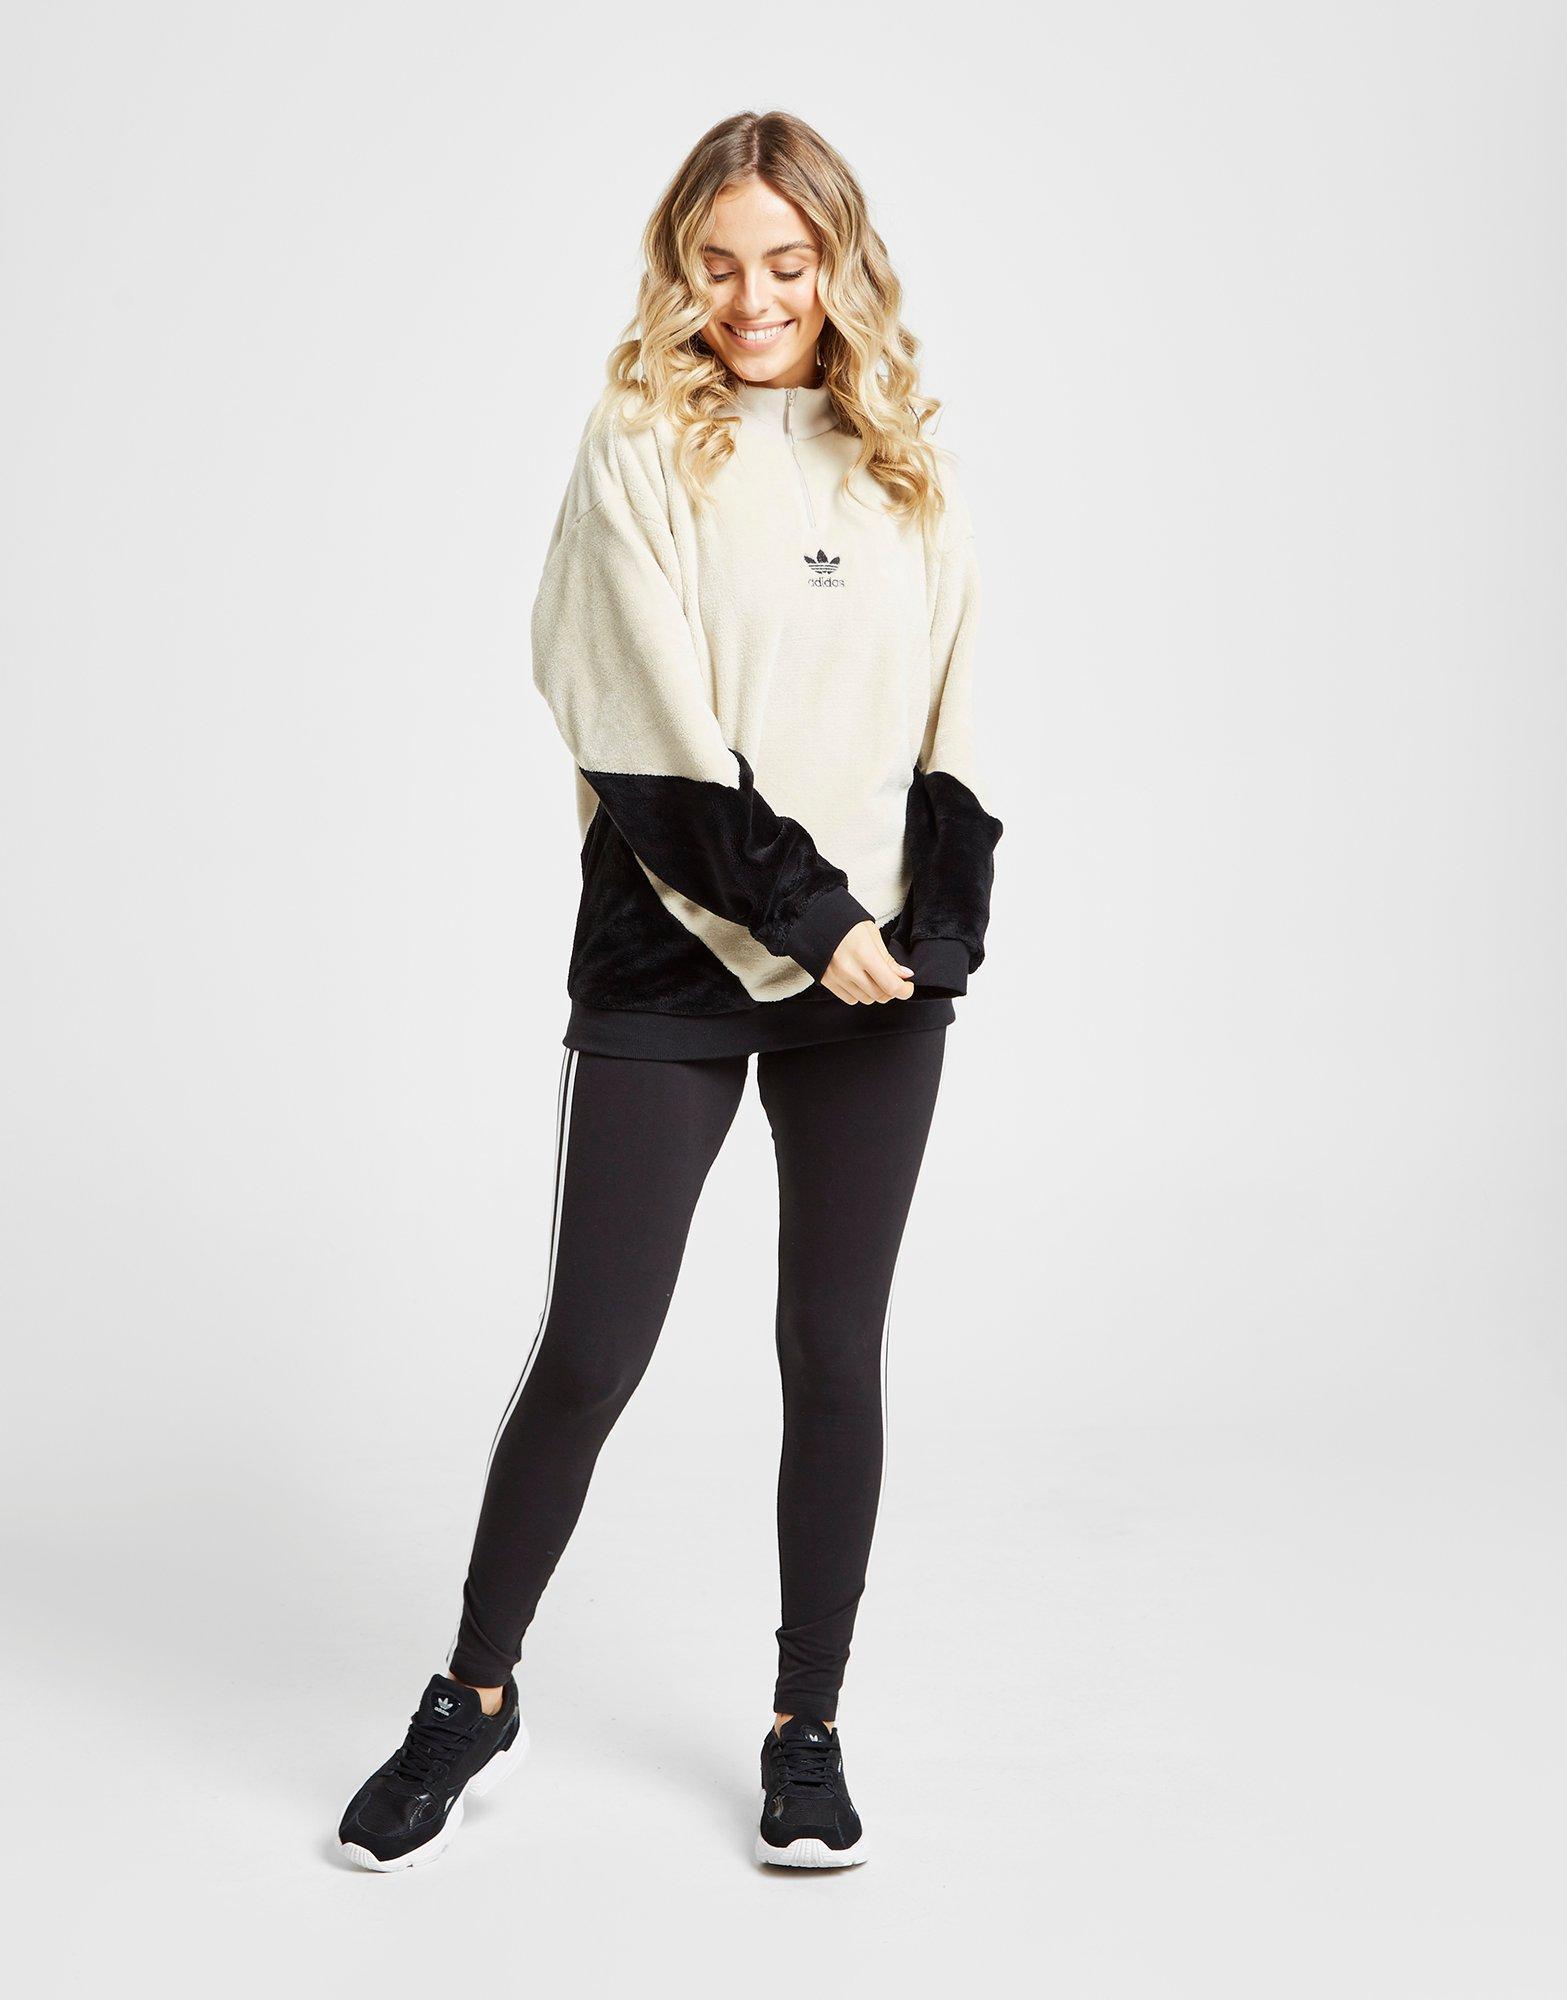 adidas essential 1/4 fleece track top womens